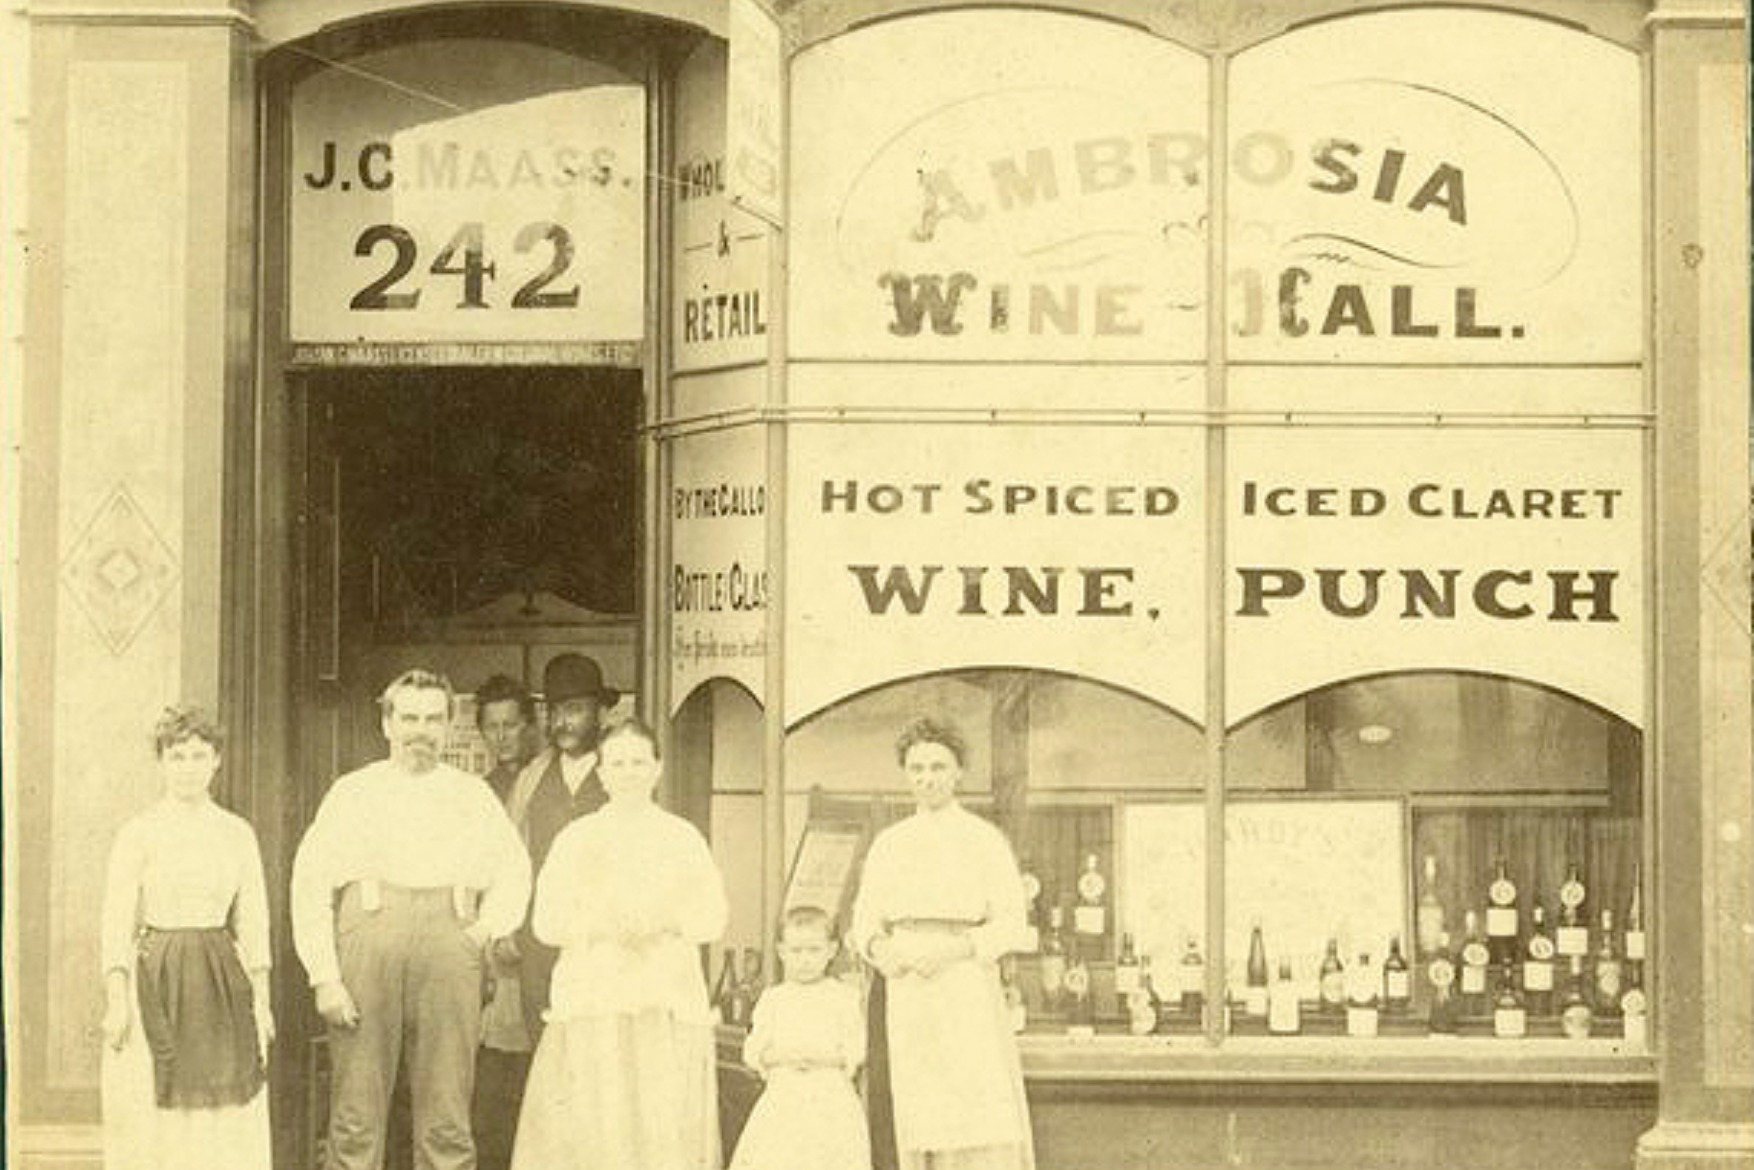 Drunk history: Bottle shops, urban life and public order